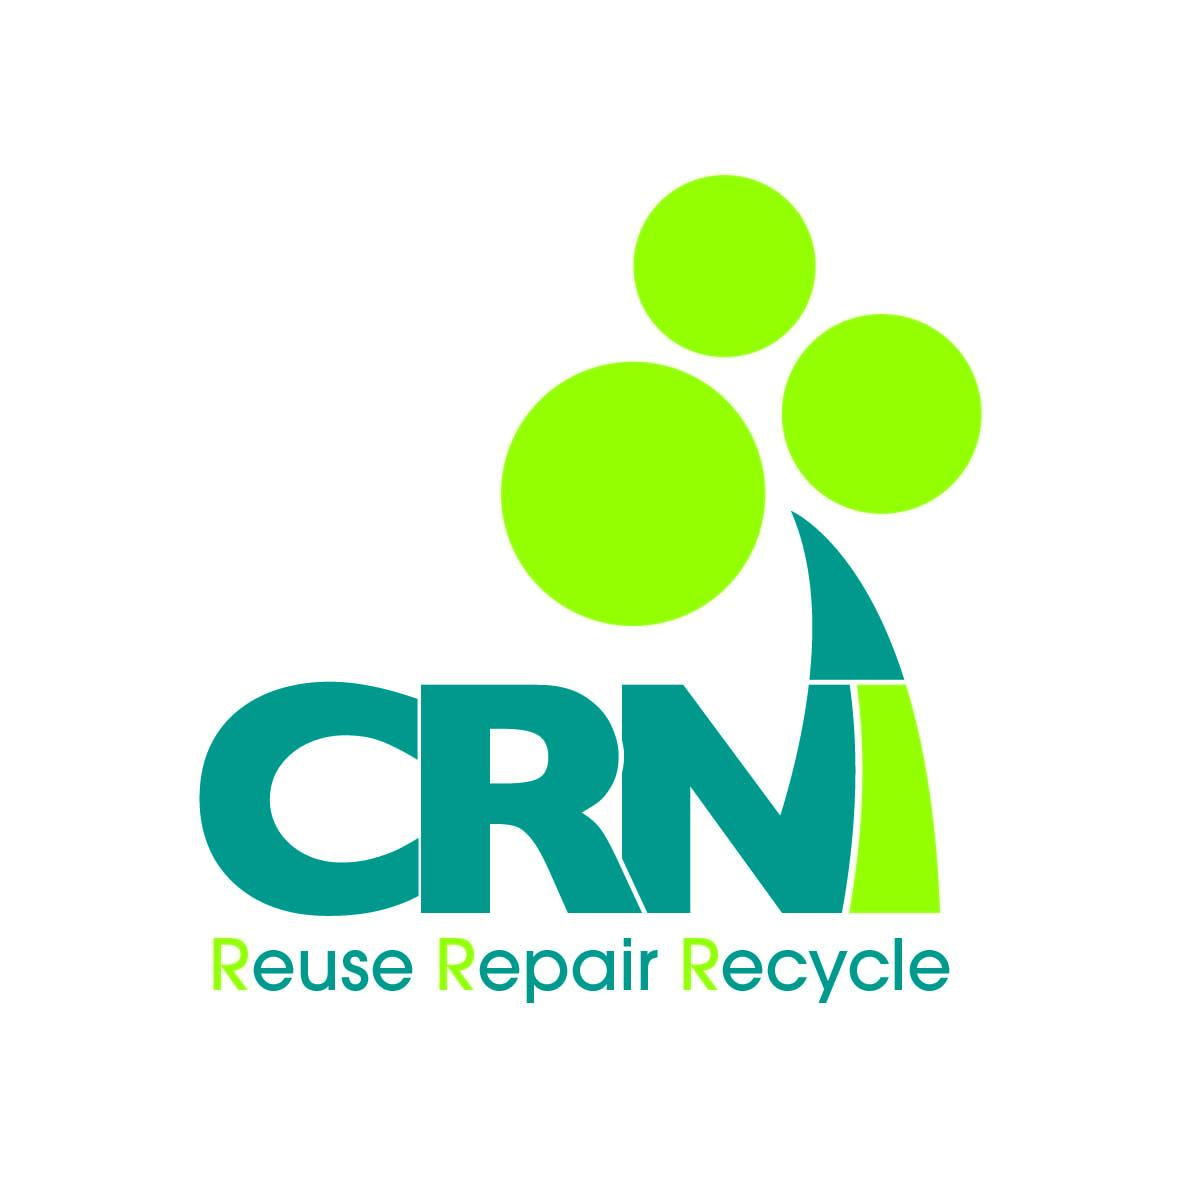 CRNI New logo x 3 -01